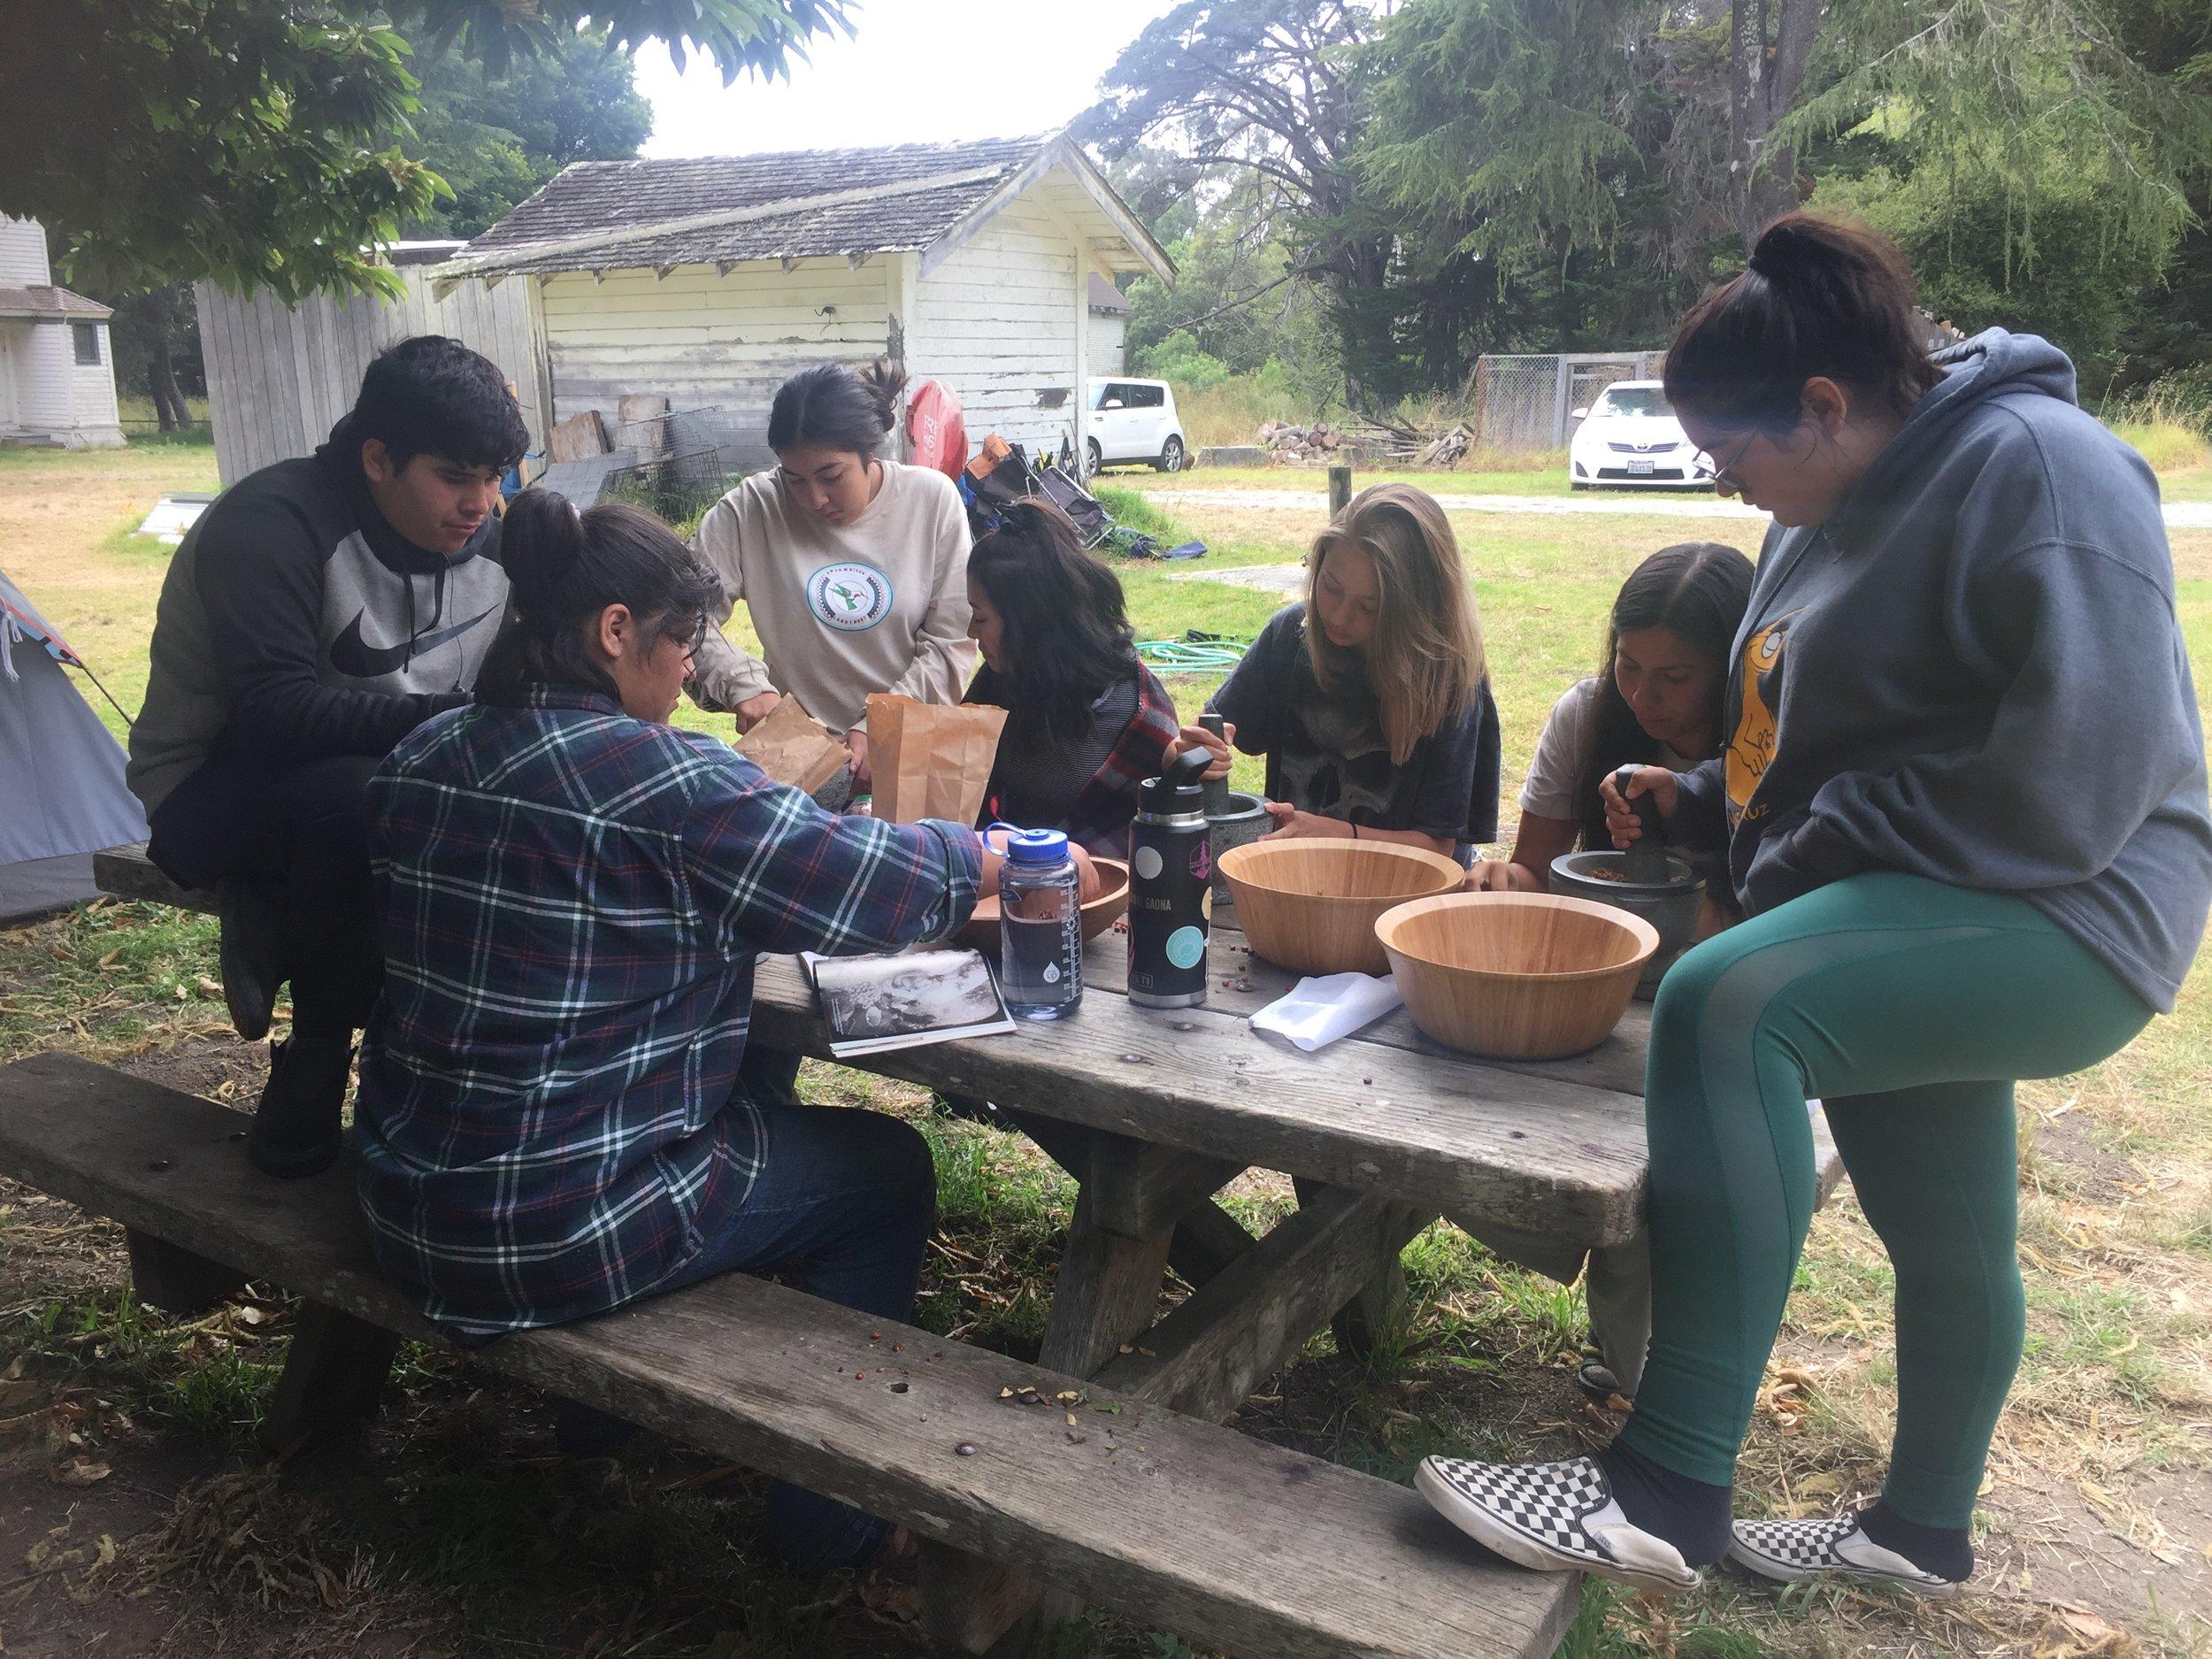 Amah Mutsun youth learning how to make manzanita cider during the internship program.